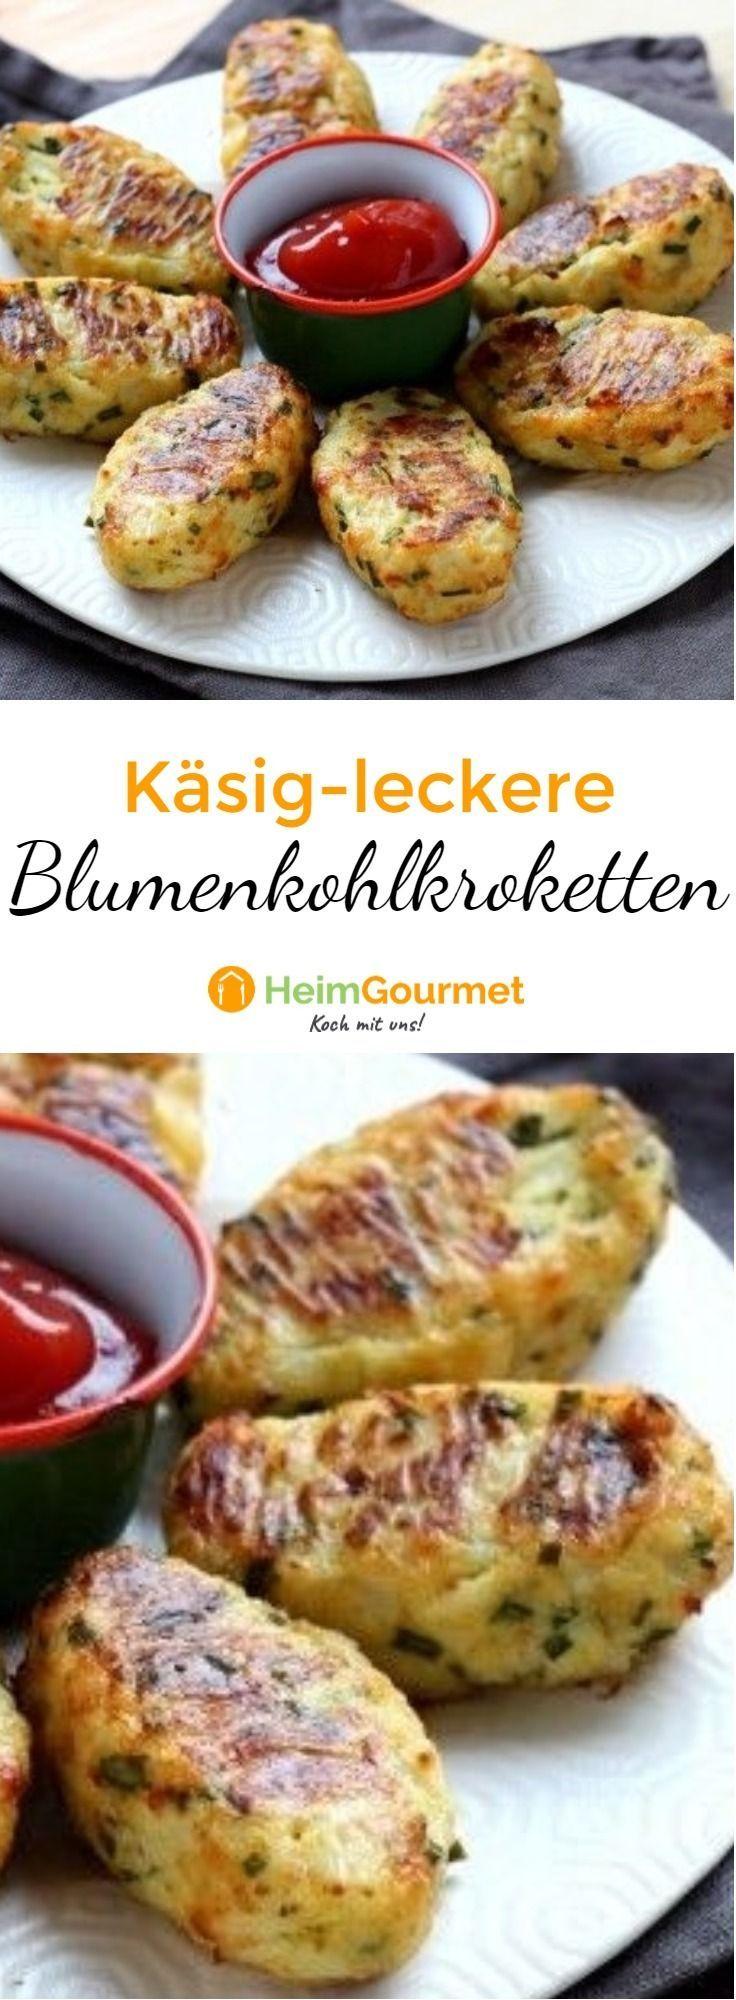 Rezept für Blumenkohl-Kroketten mit Käse